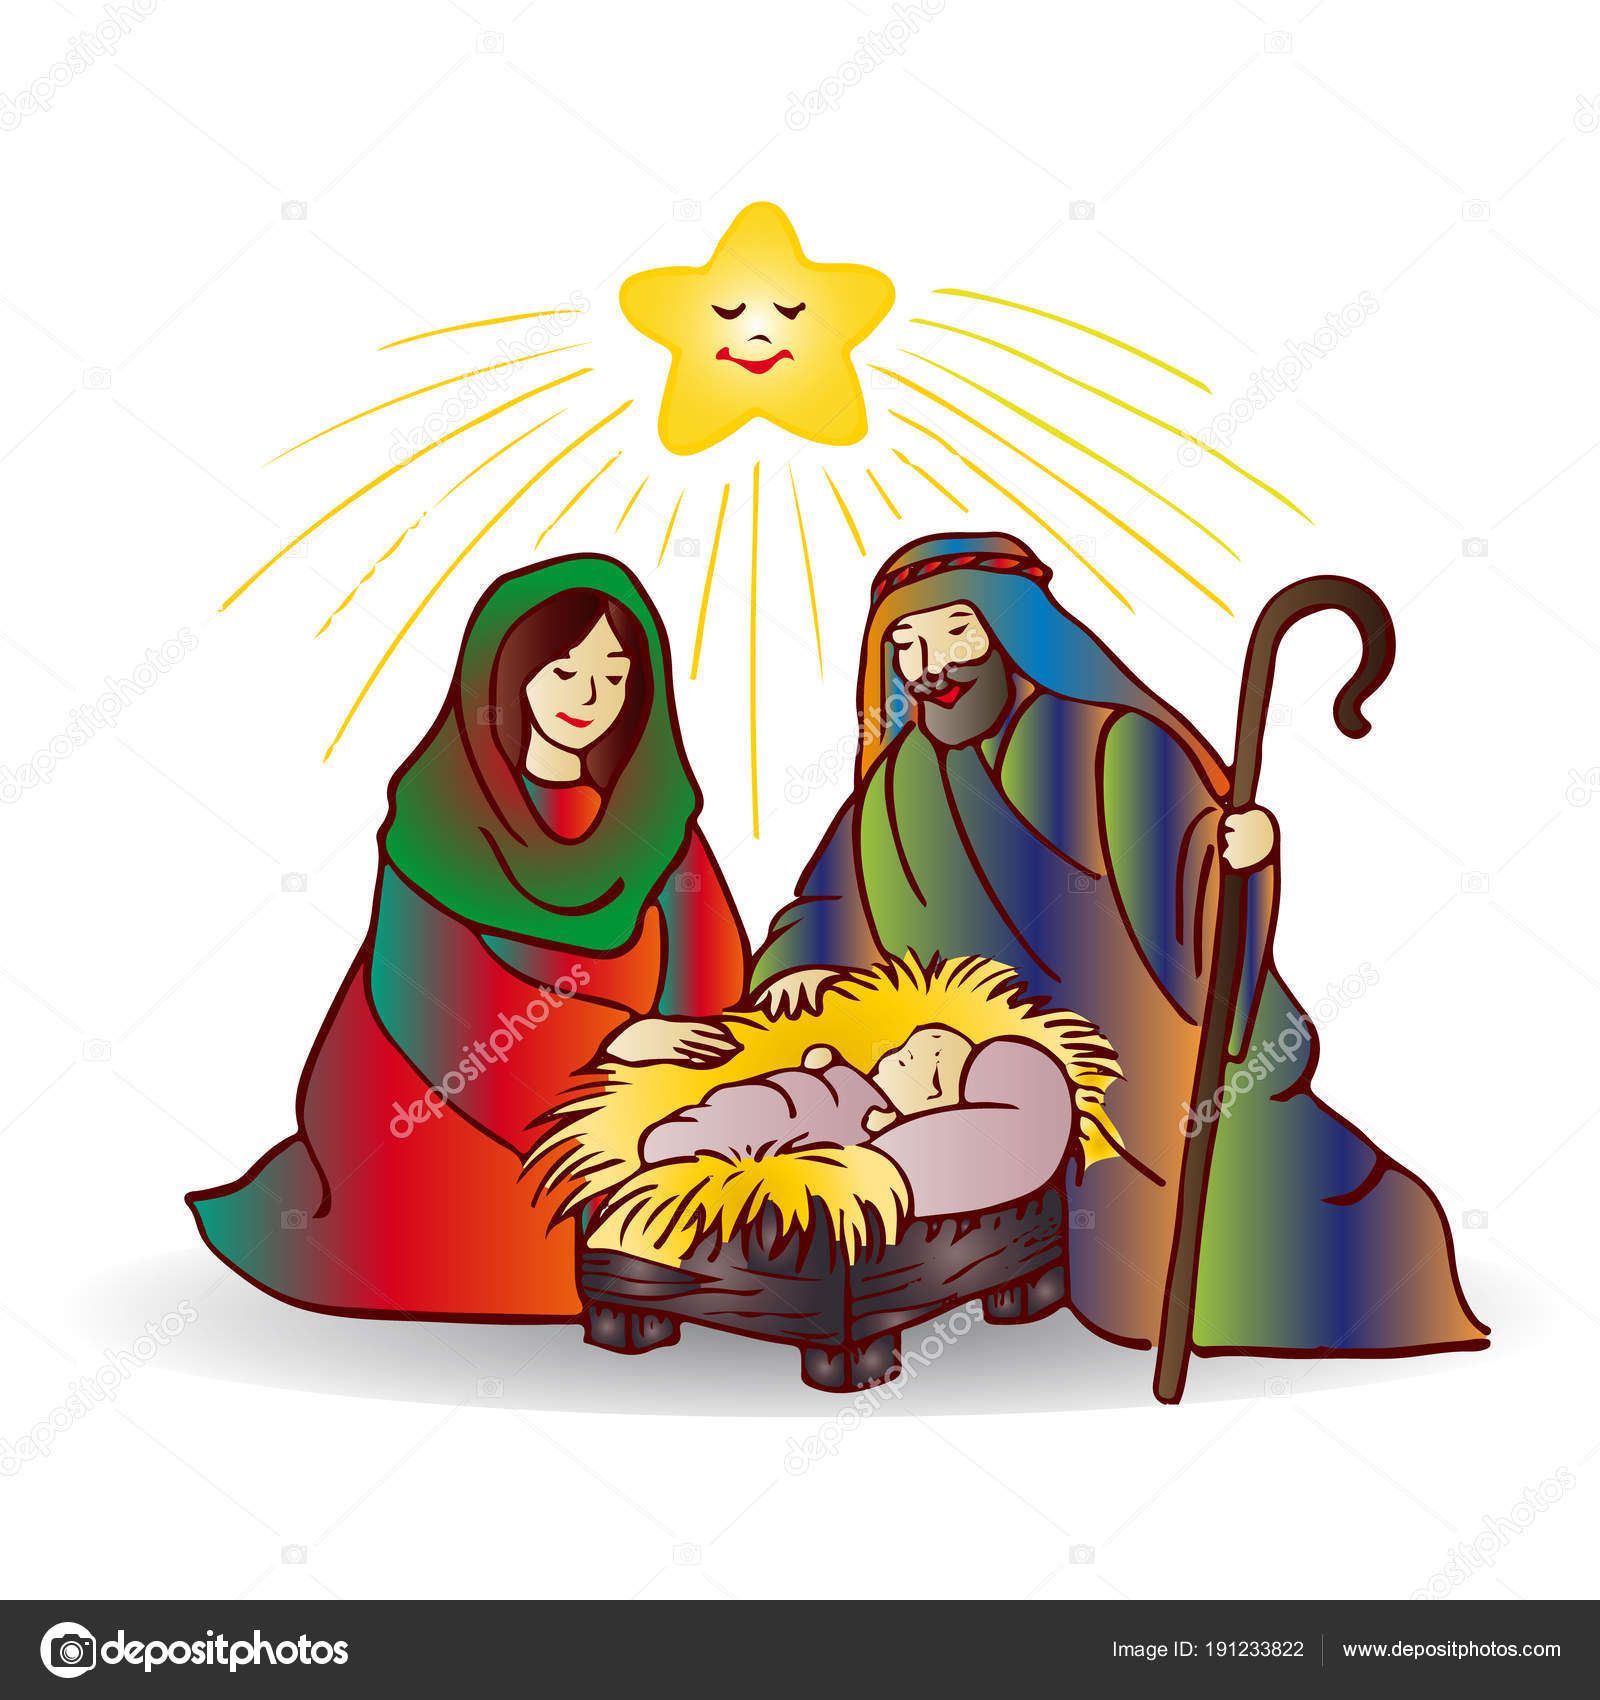 Dibujos De Navidad Con Jesus.Ilustracion De Navidad Jesus Cristo De Dibujos Animados